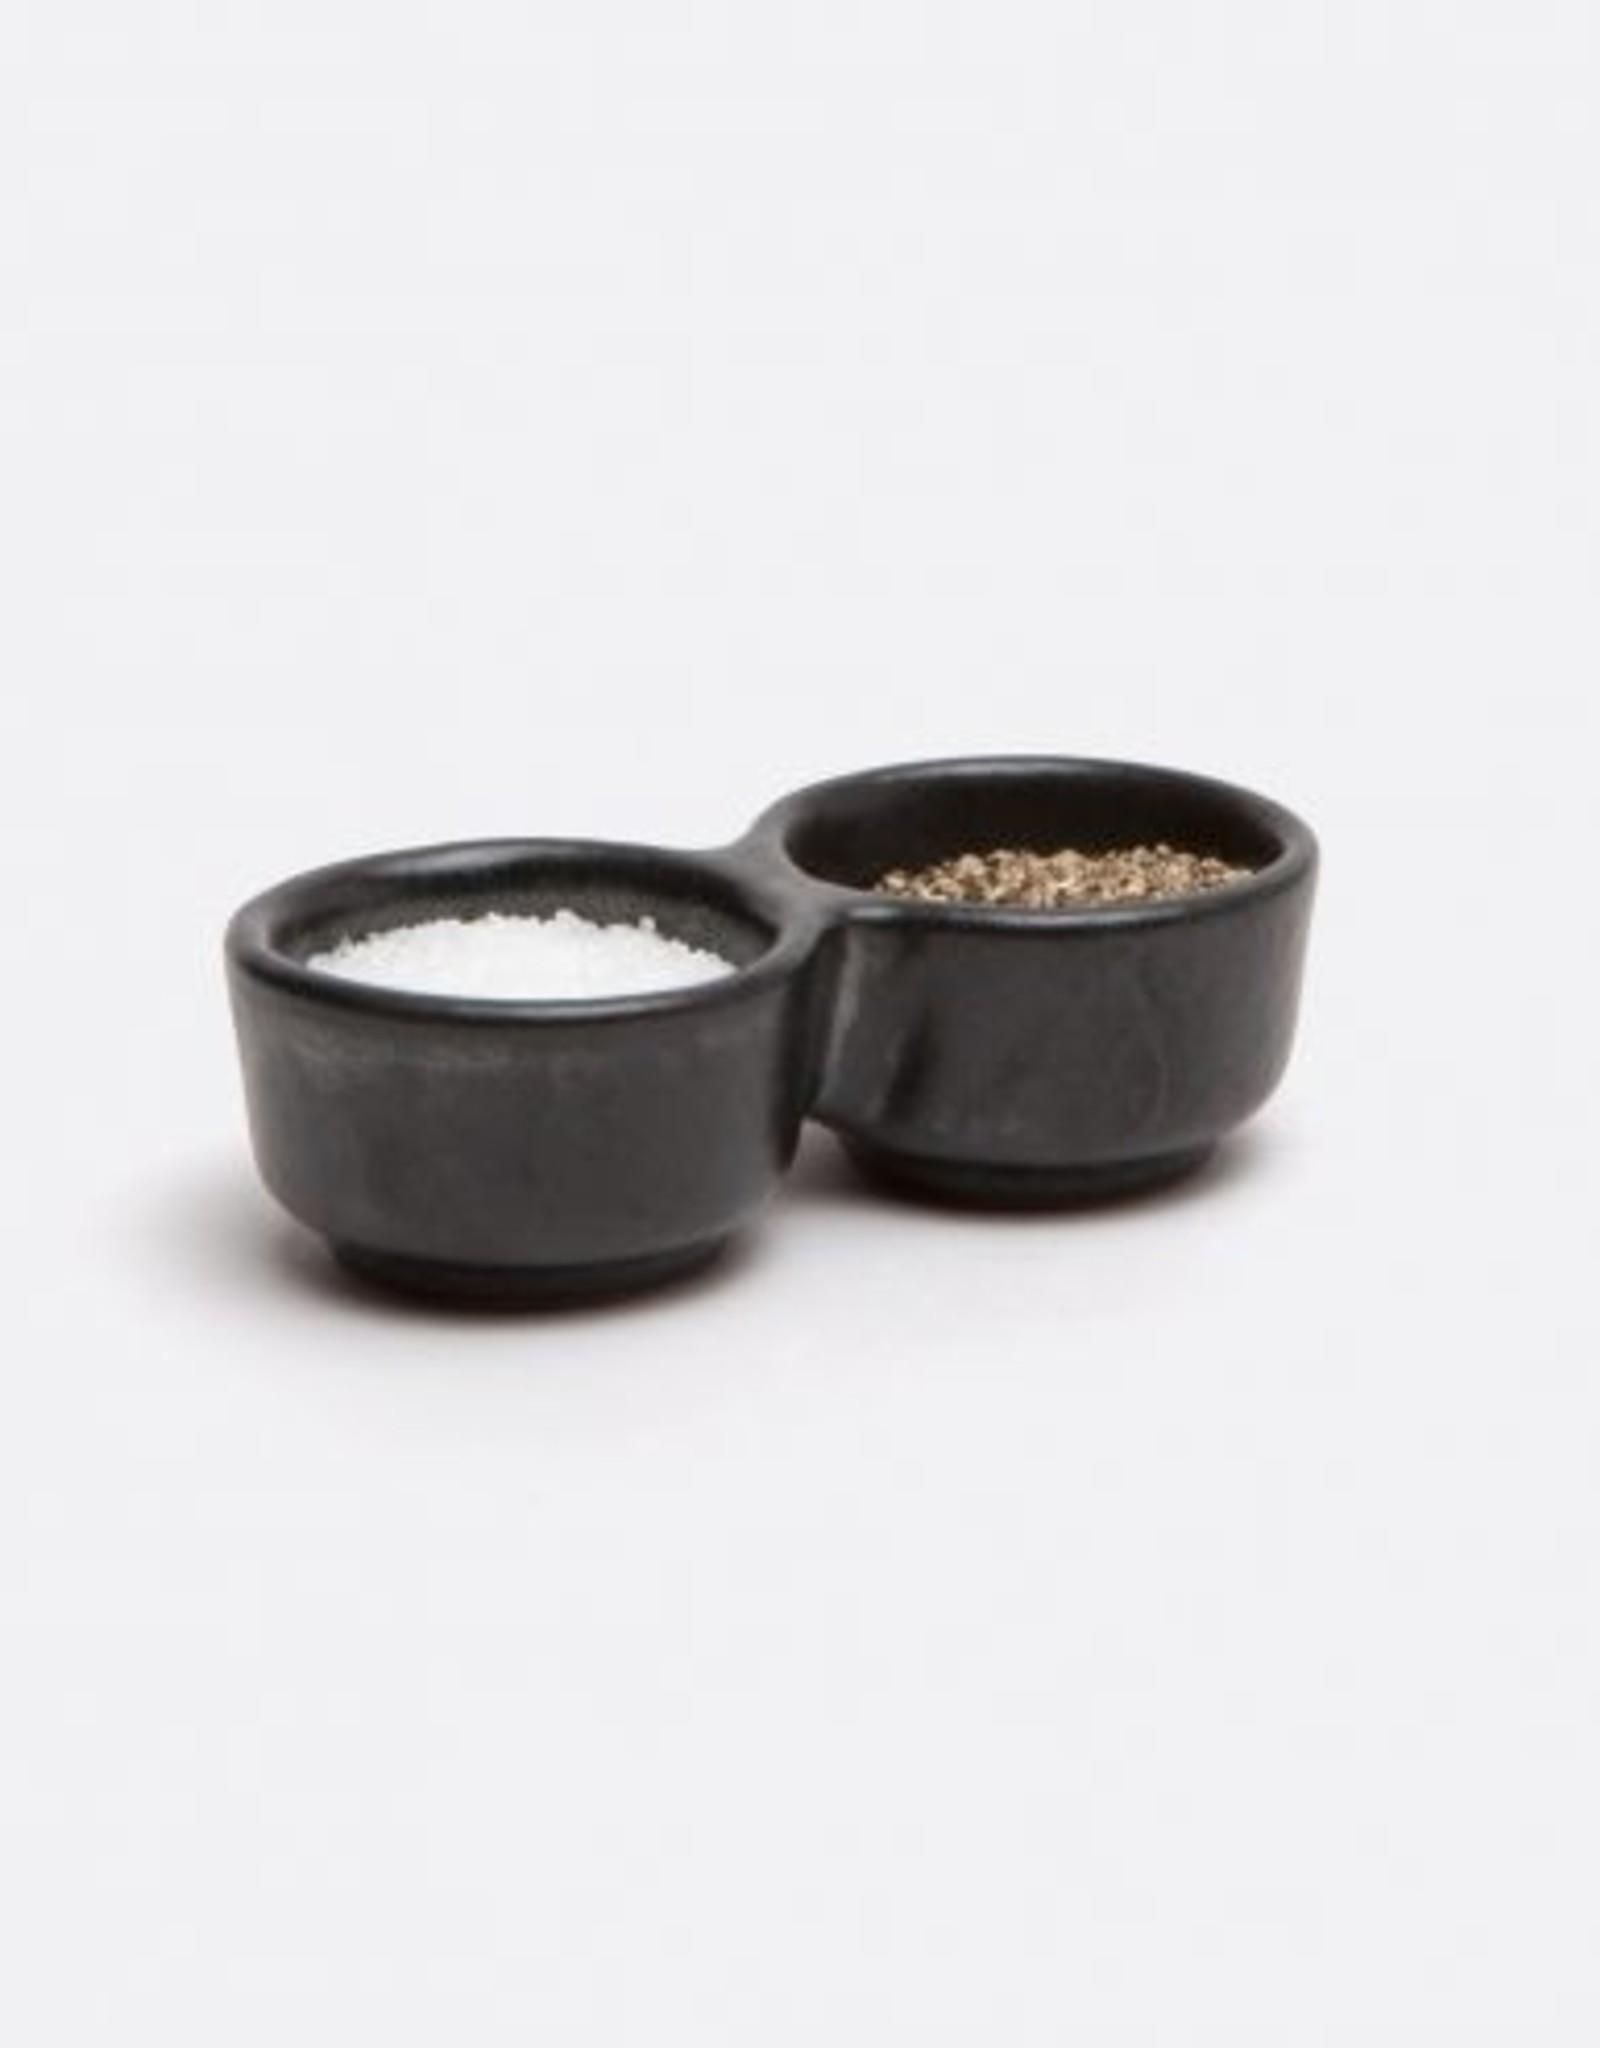 Blue Pheasant Holly Pinch Bowls